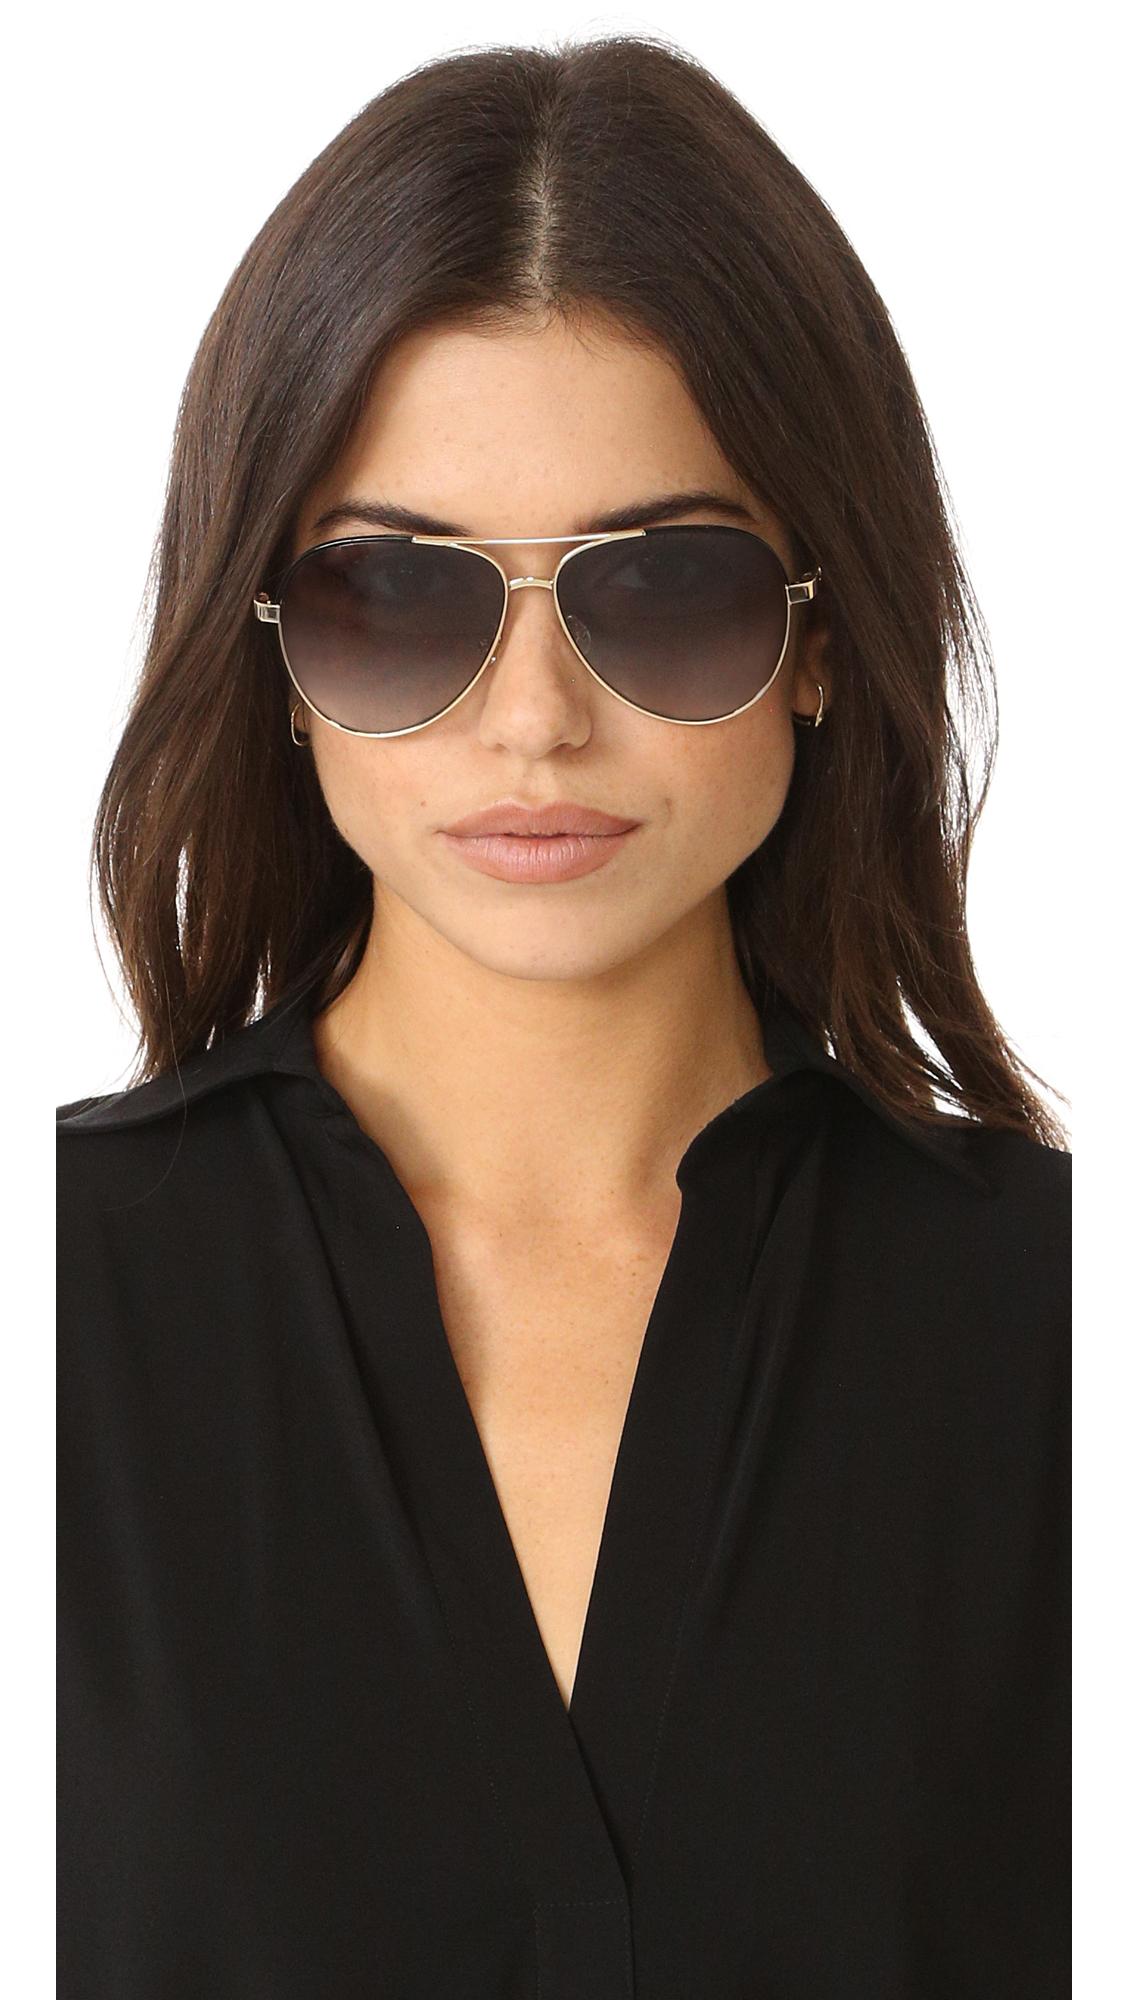 bed69ddc6 Kate Spade New York Amarissa Sunglasses   SHOPBOP